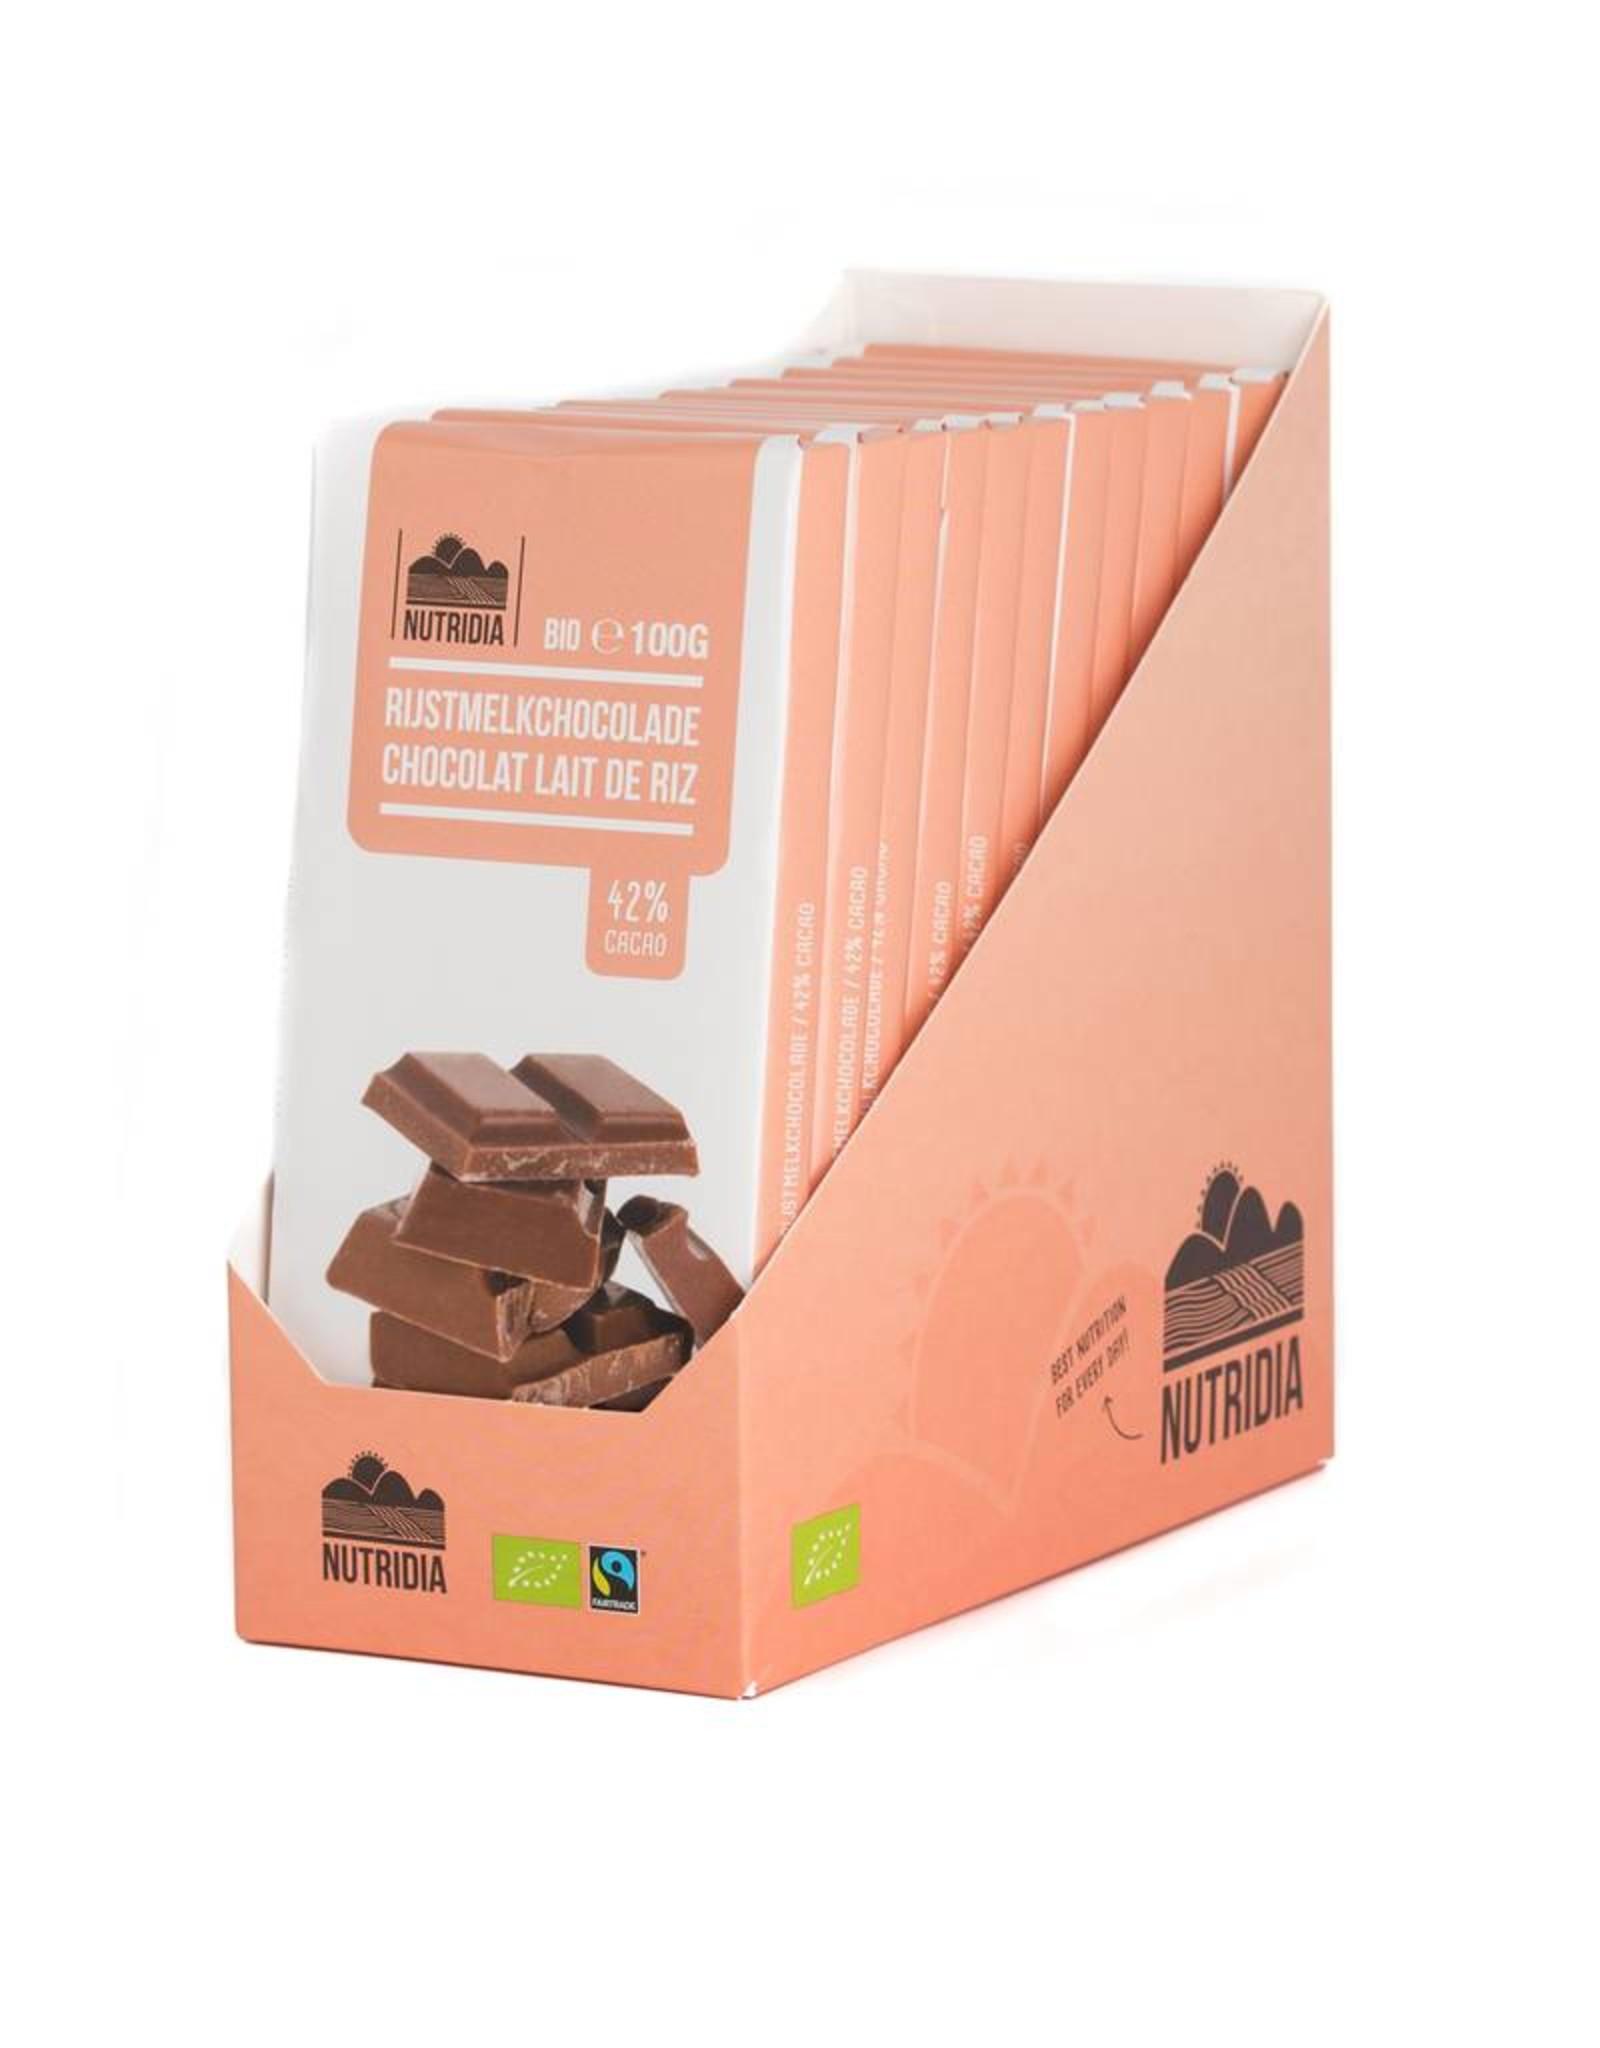 Nutribel Tablet rijstmelkchocolade bio 100g 12 stuks